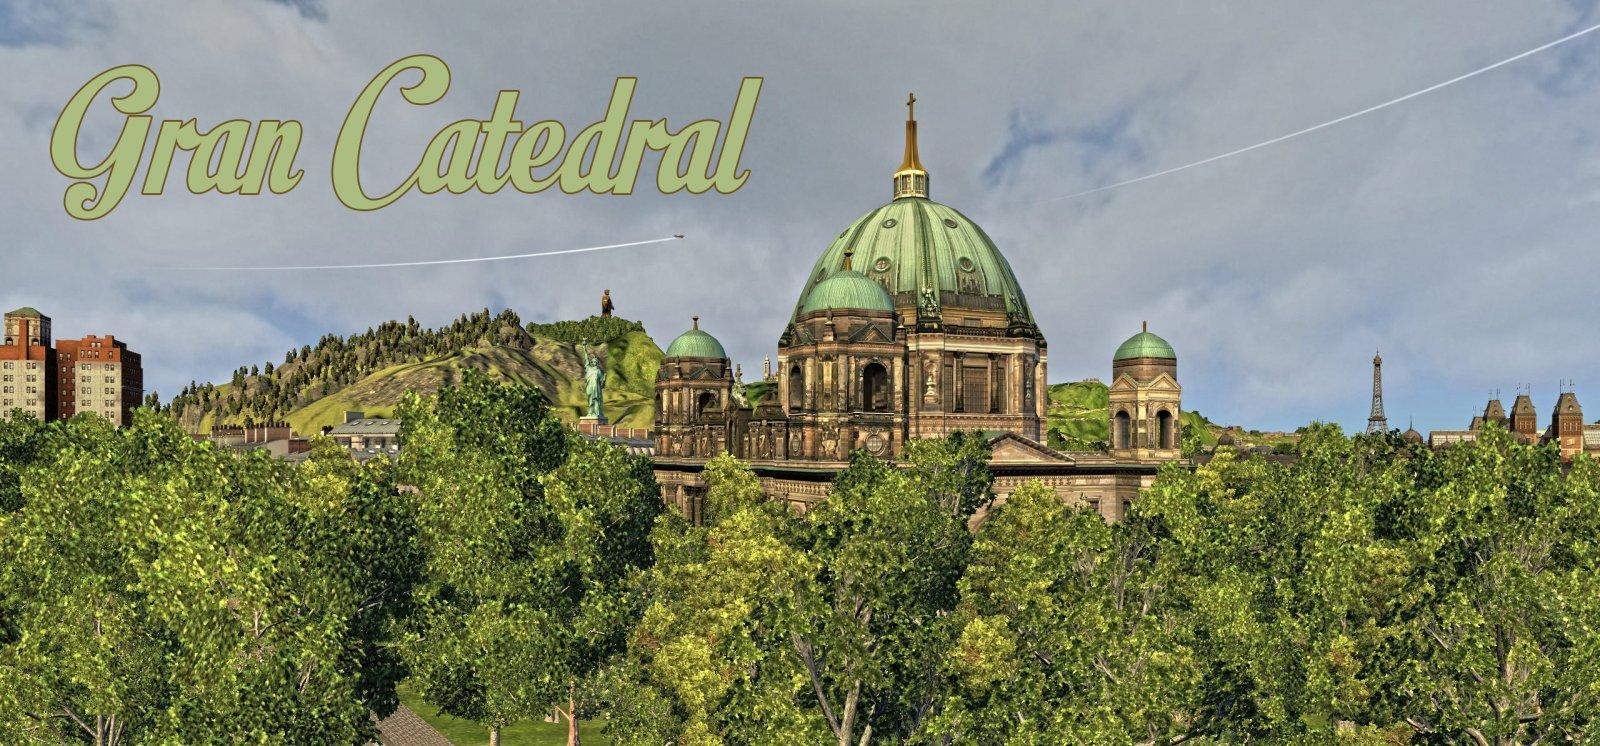 gran catedral.jpg